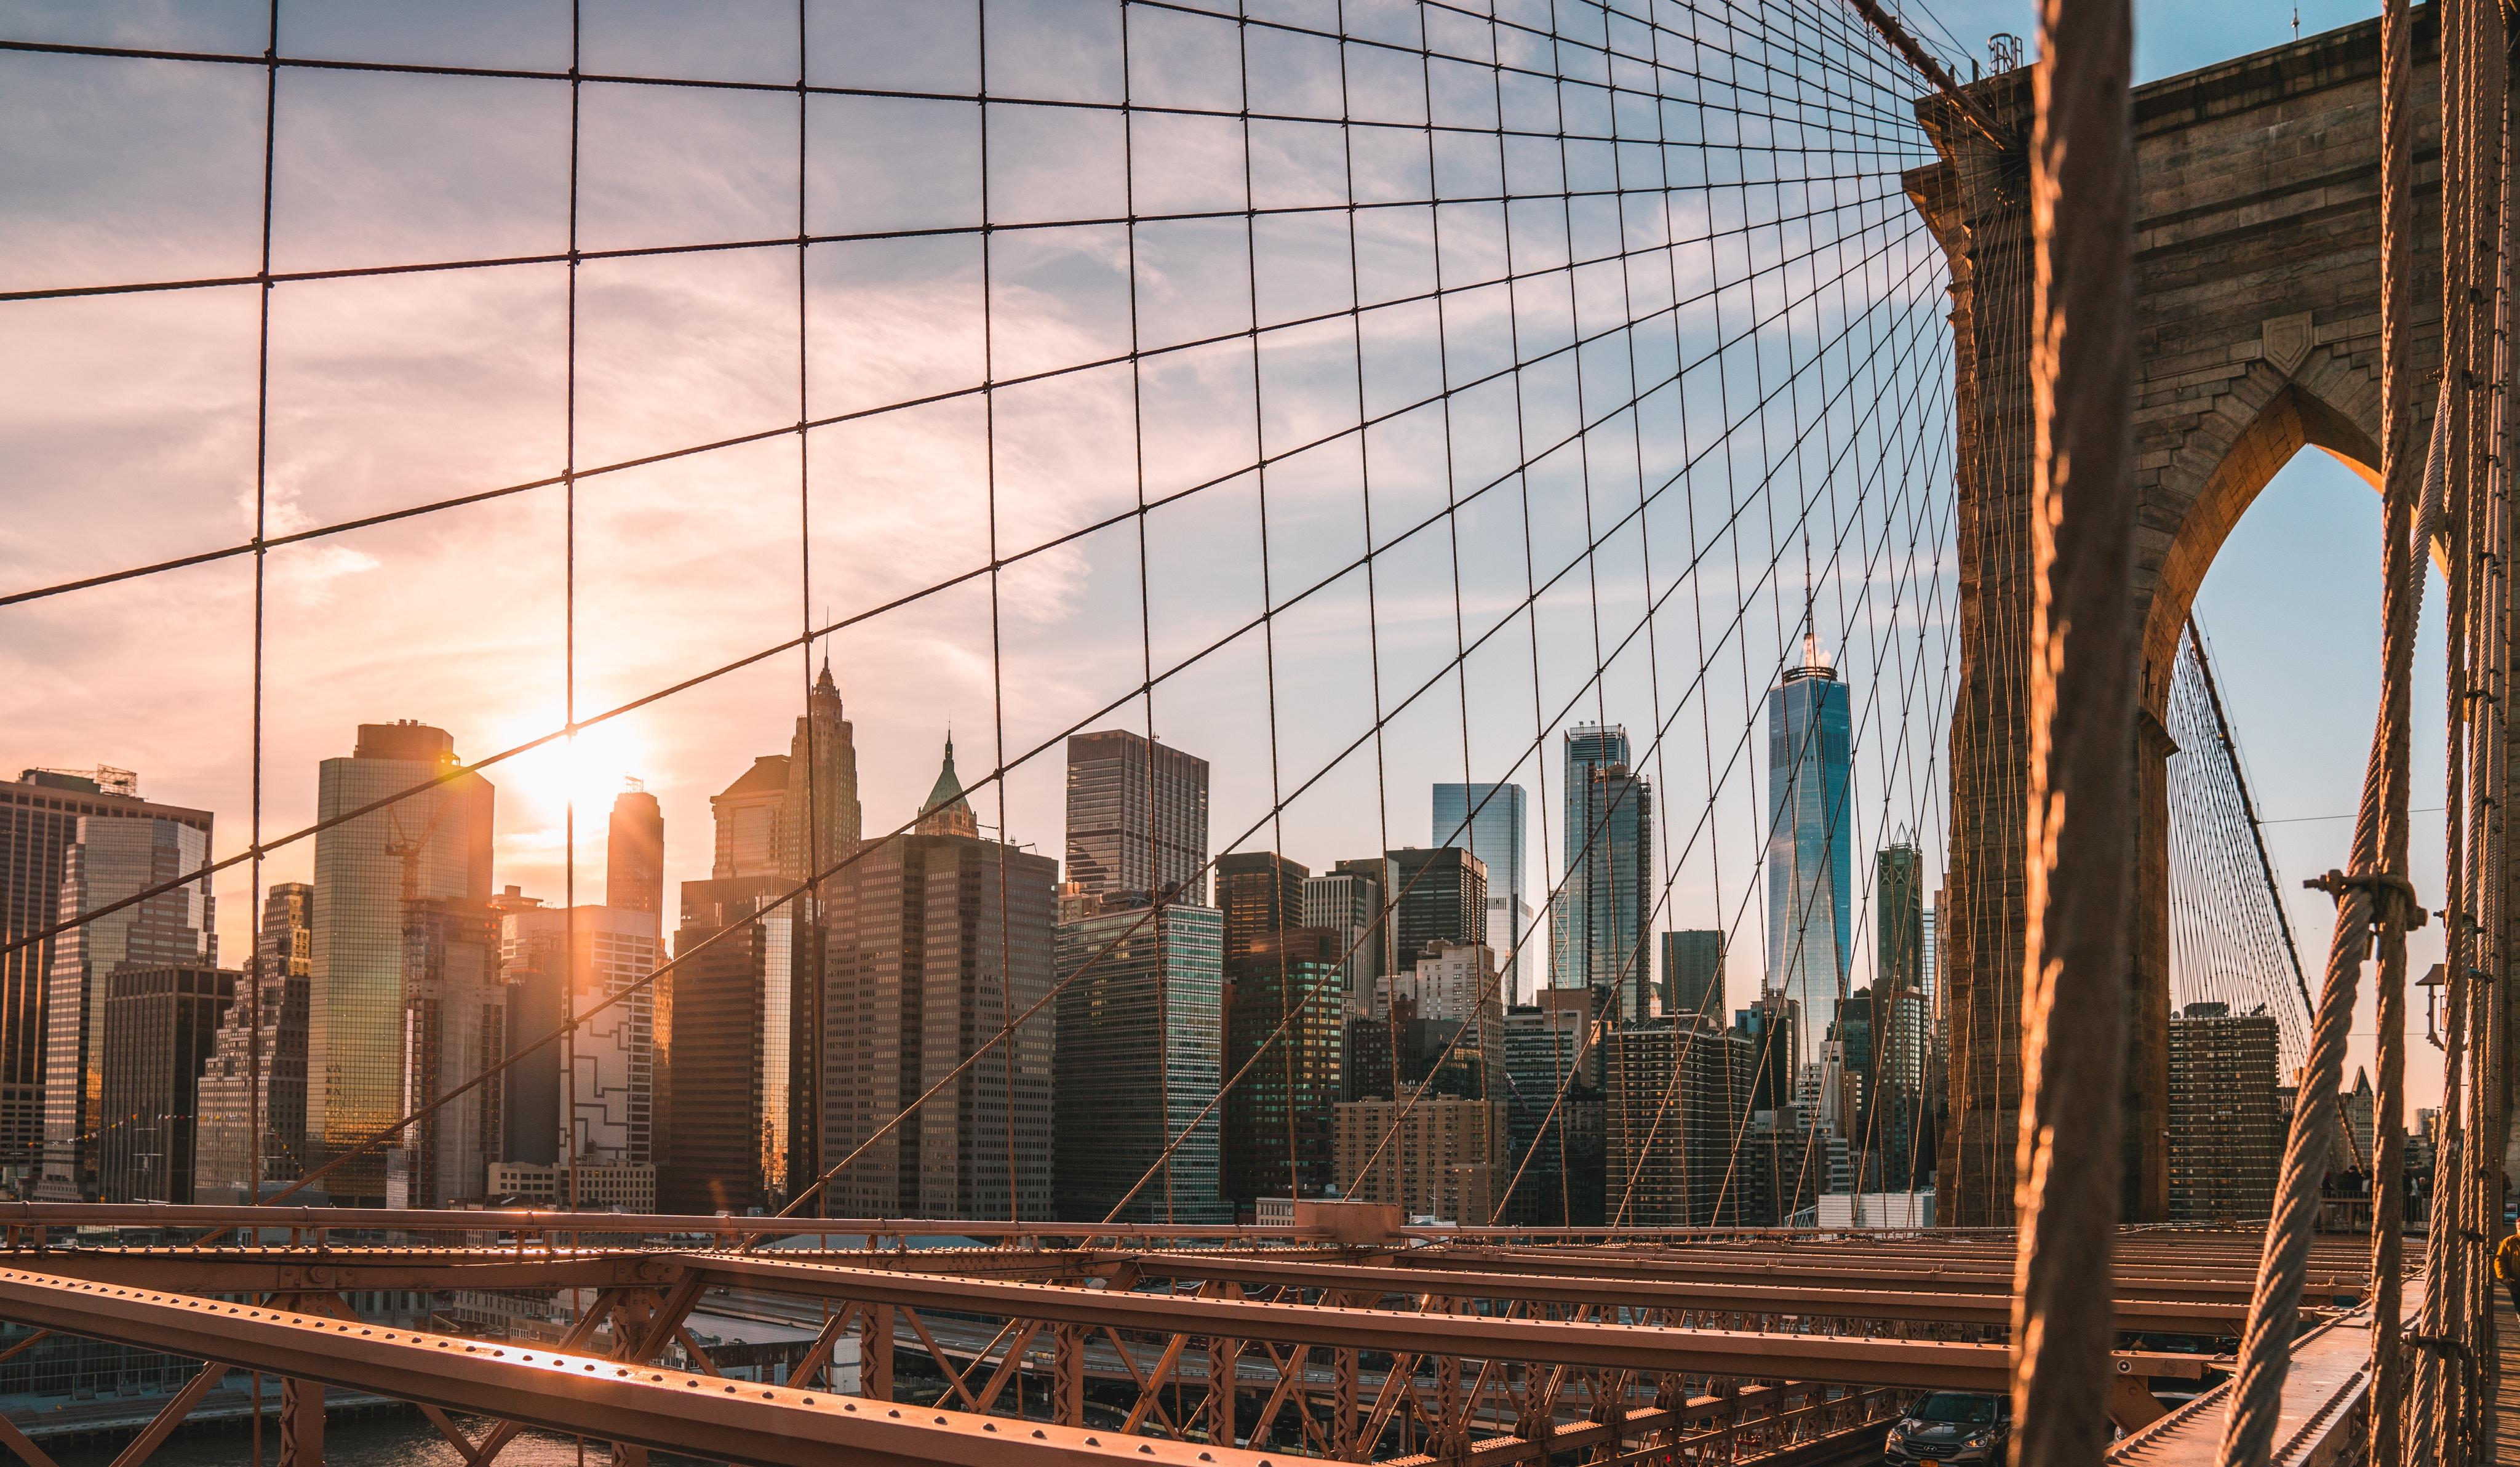 moving to Brooklyn - Brooklyn bridge and sunset